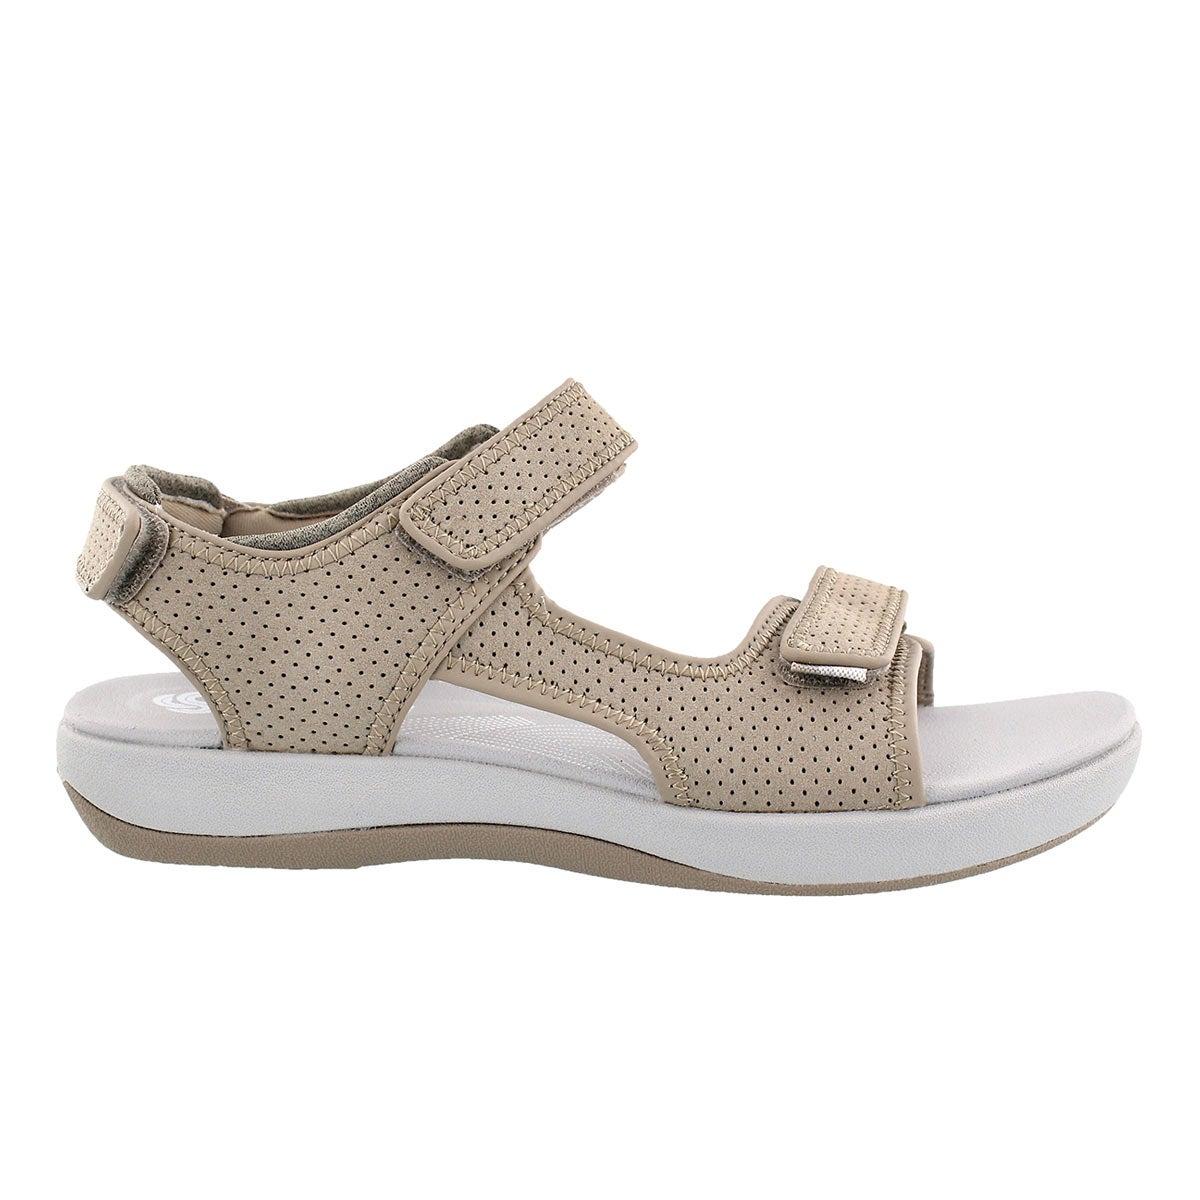 Lds Brizo Sammie sand casual sandal